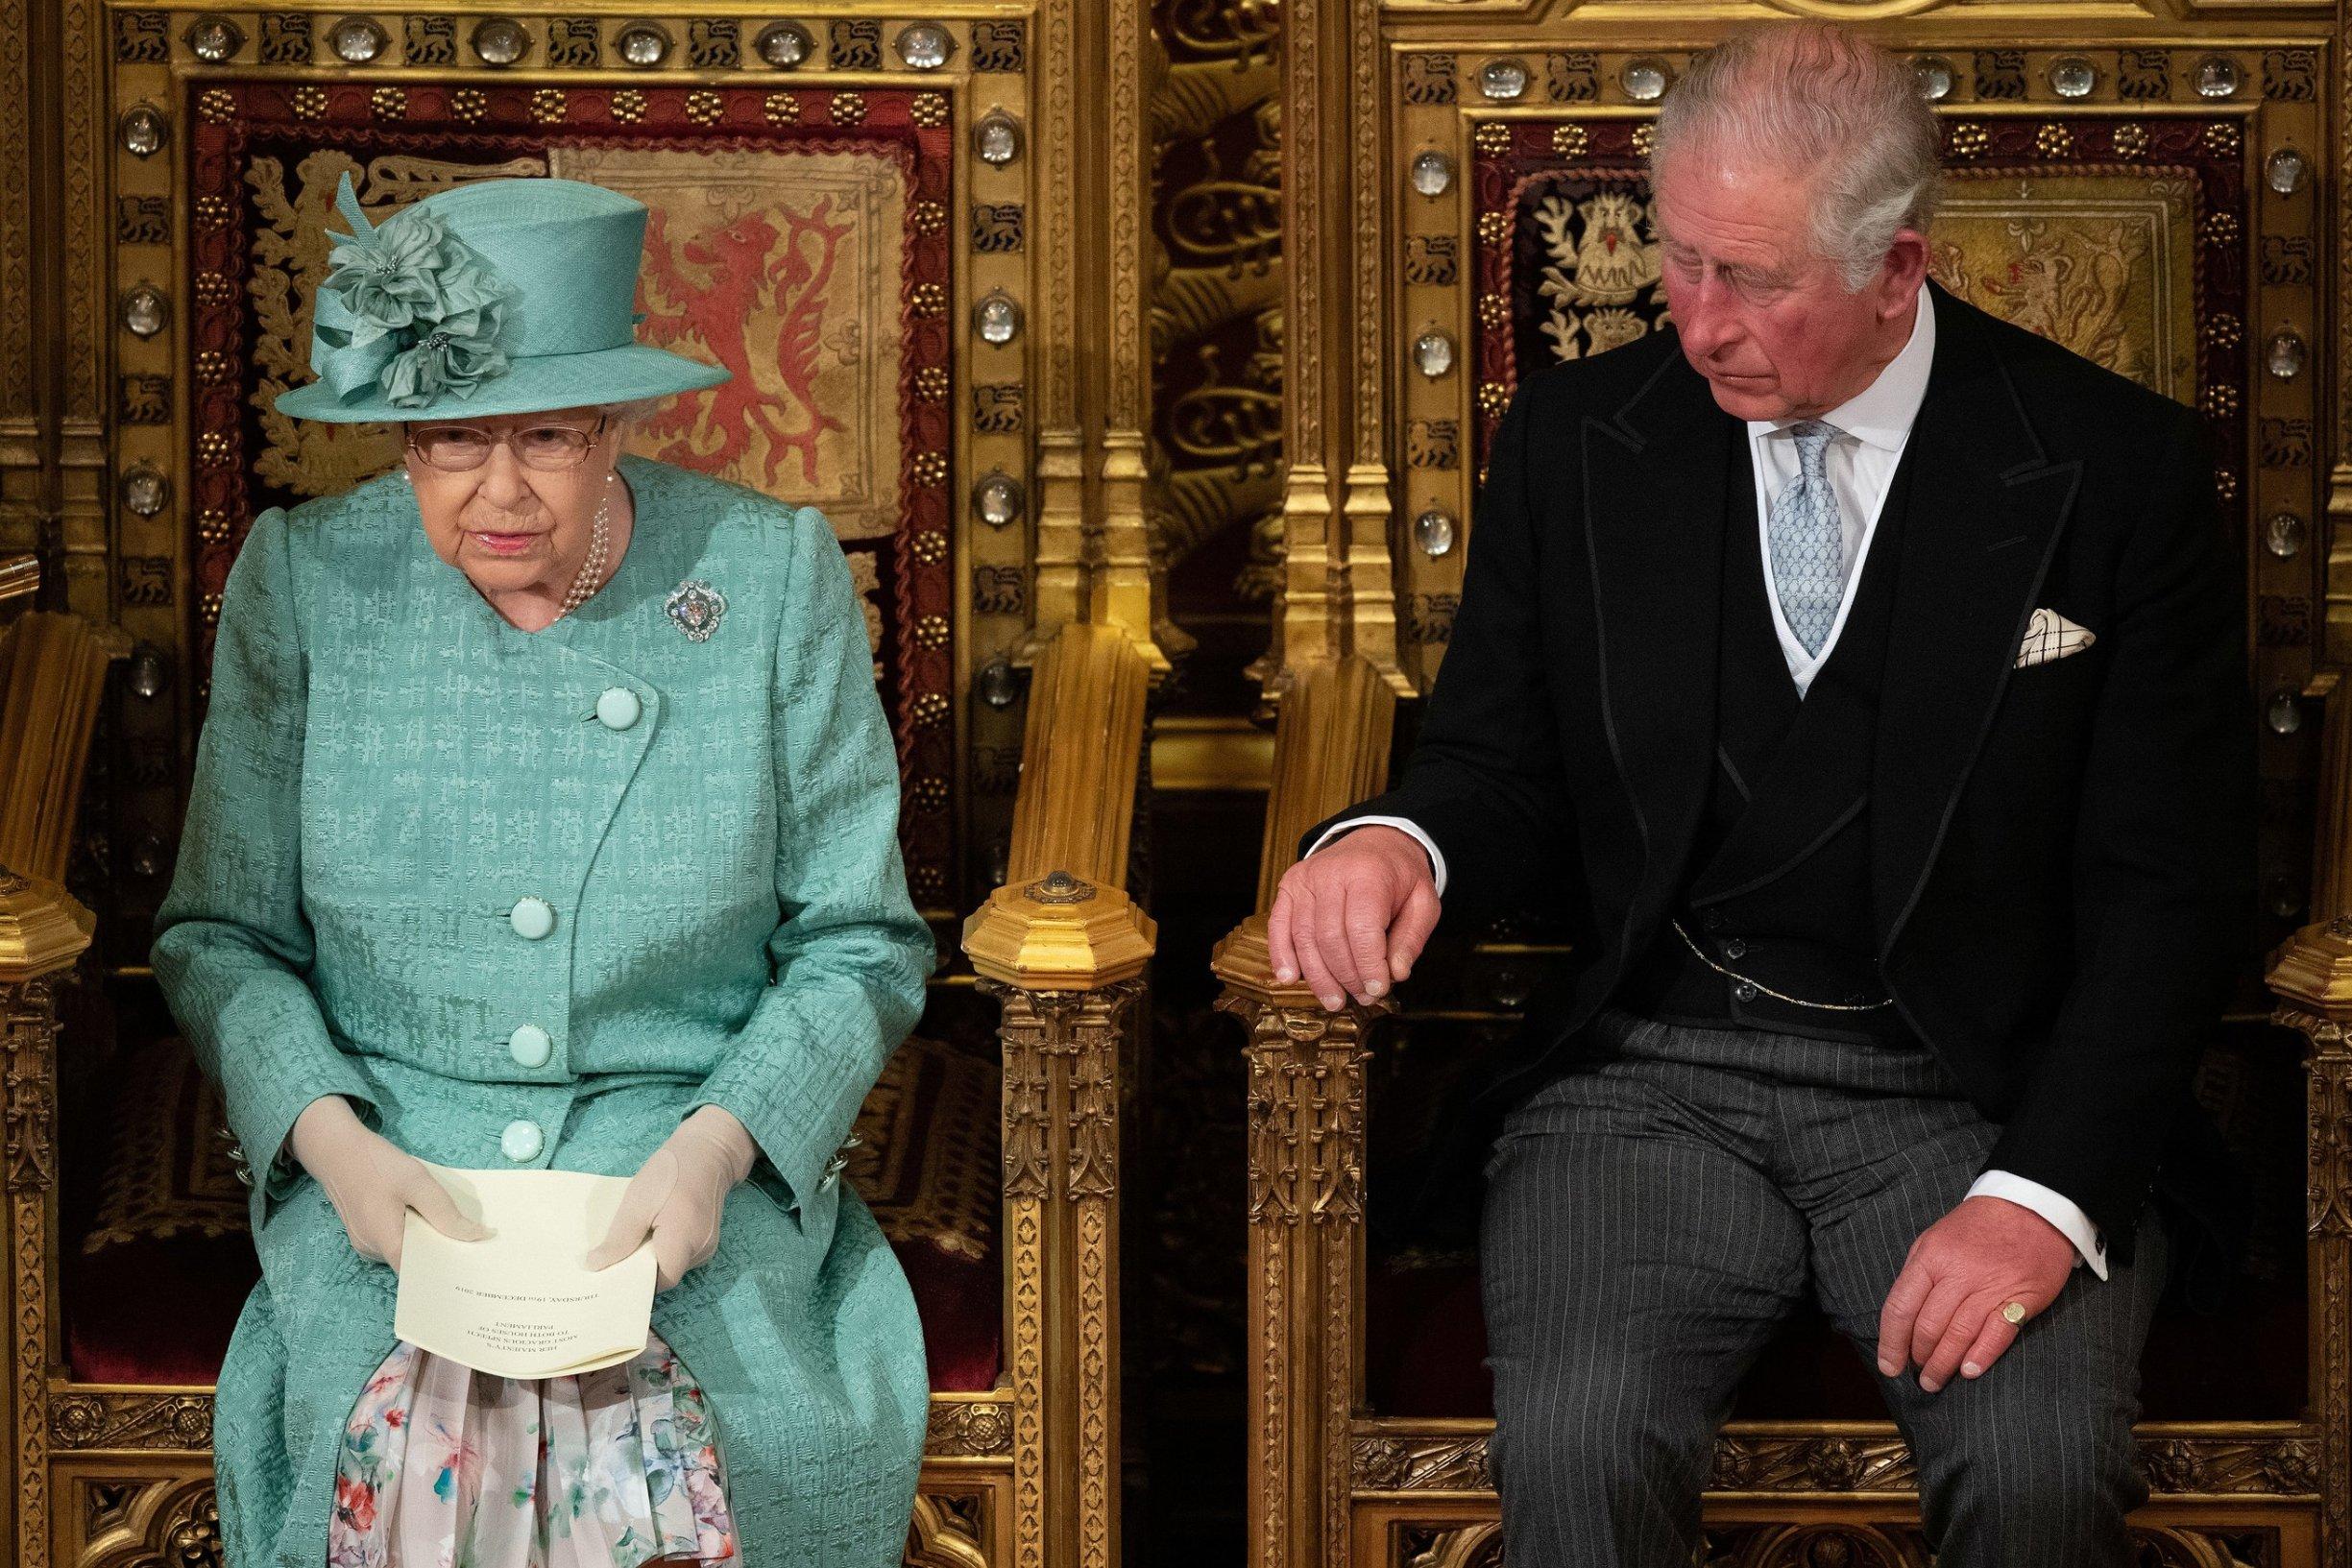 Britanska kraljica Elizabeta II pored princa Charlesa tijekom govora u Gornjem domu Parlamenta